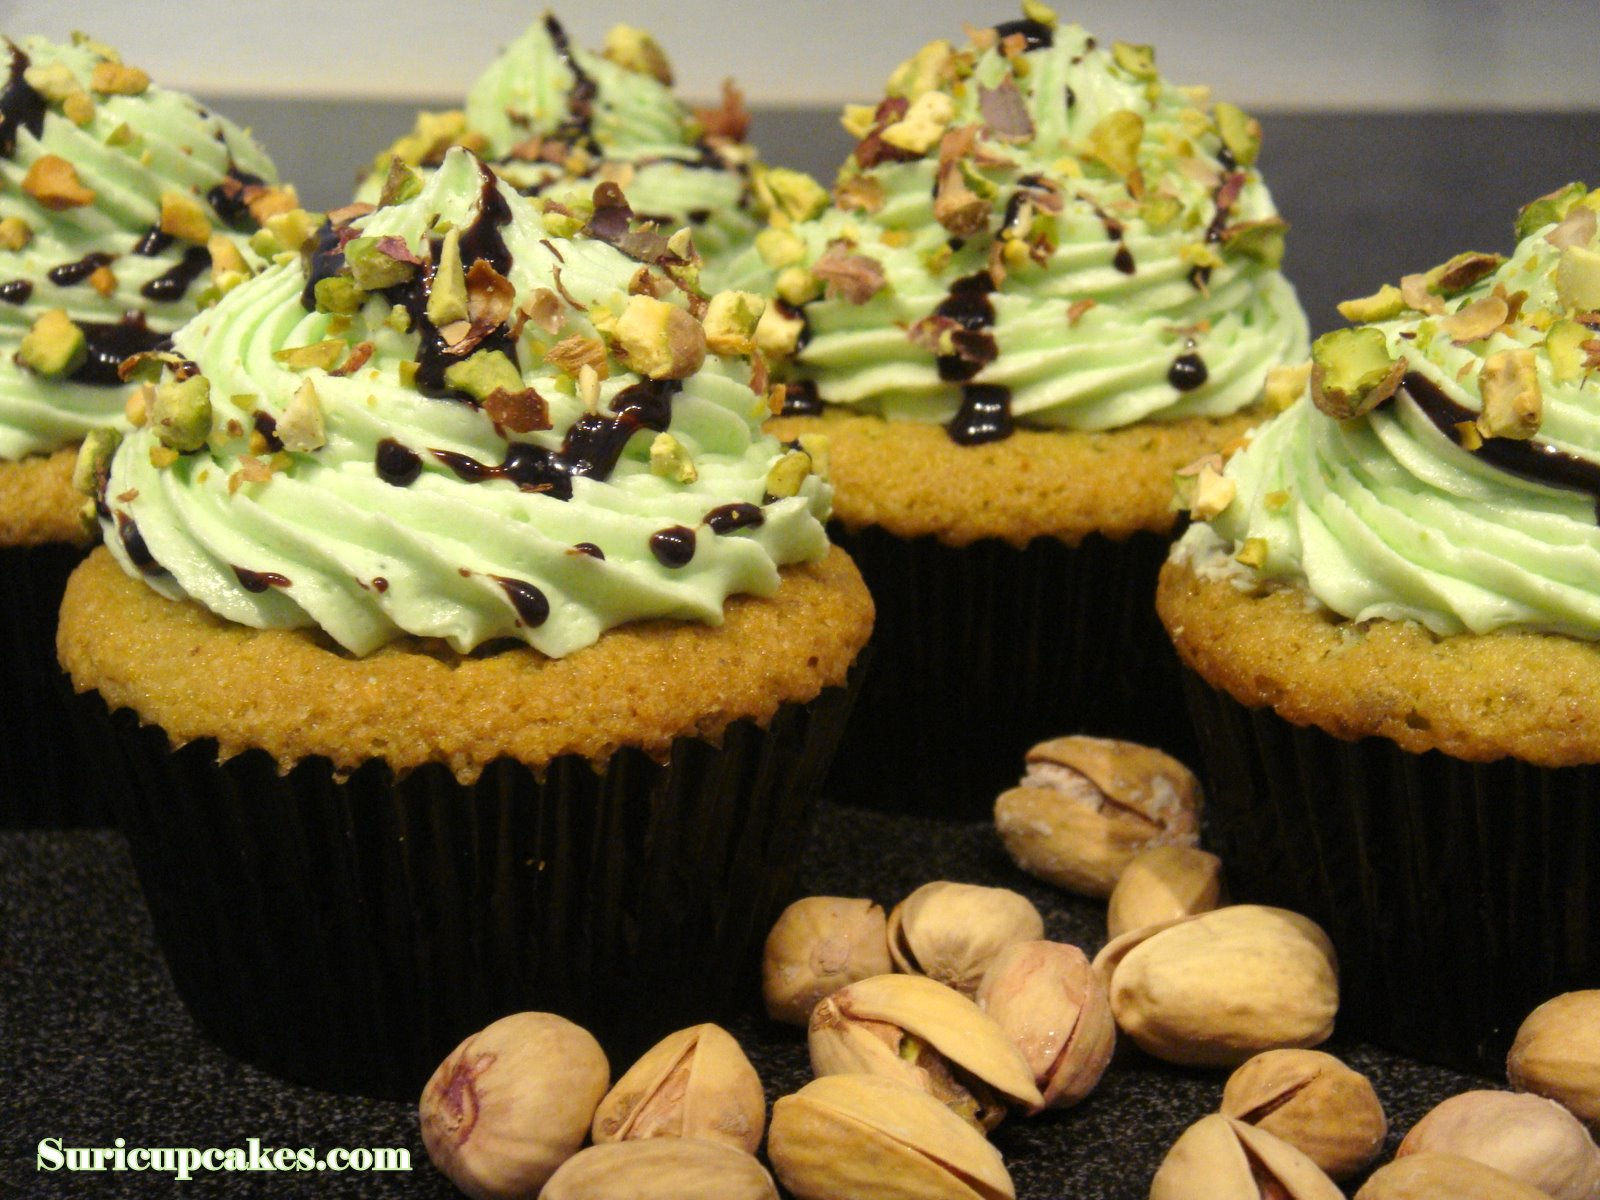 SURI CUPCAKES: Cupcakes Pistache!!